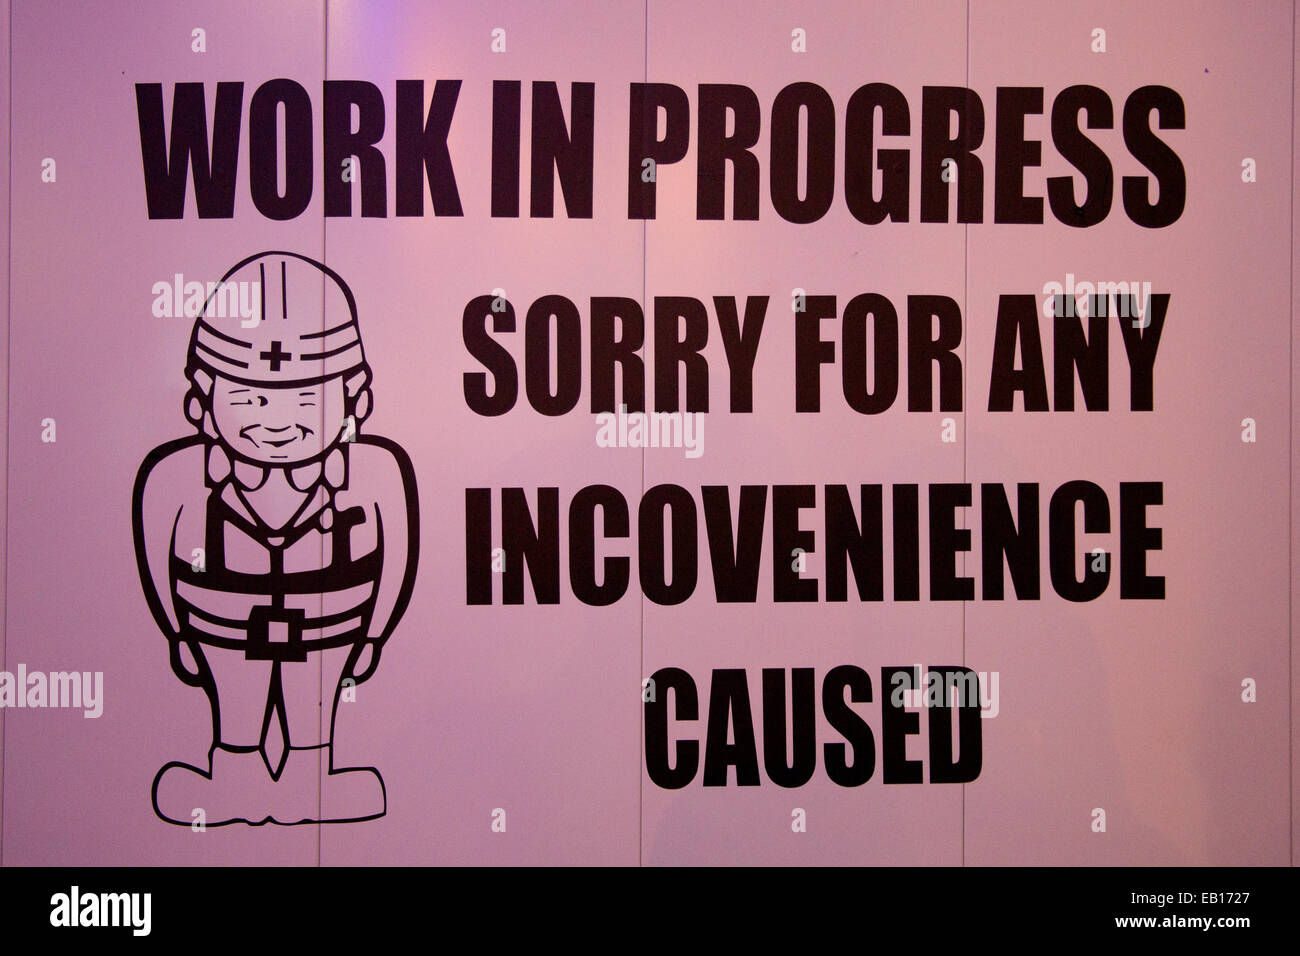 Work in Progress - Stock Image